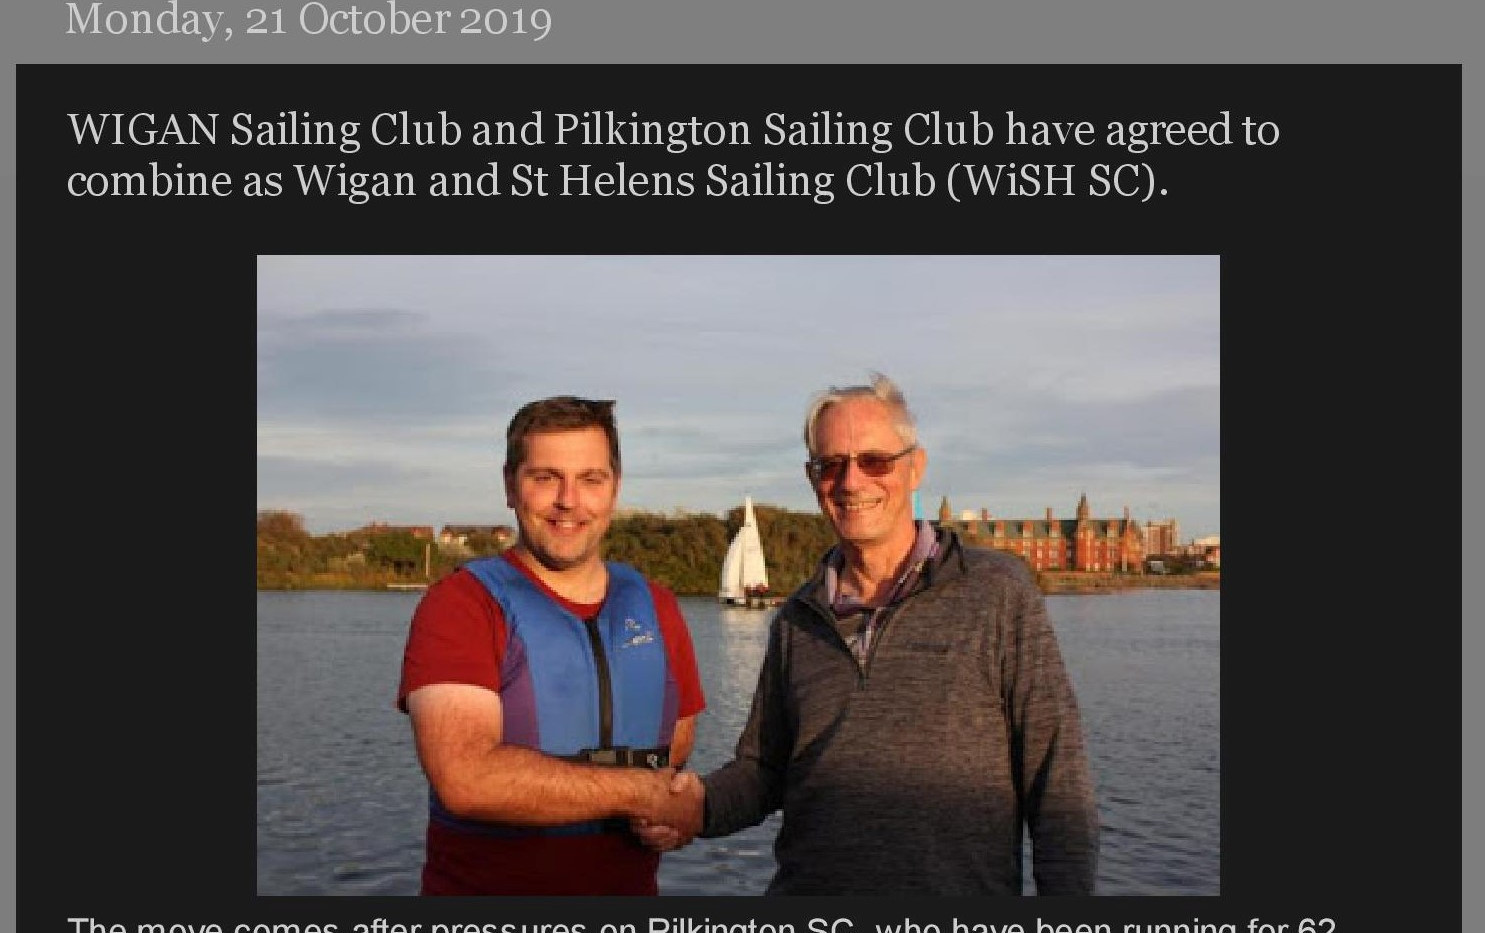 A Sailors Lot _ WIGAN Sailing Club and P